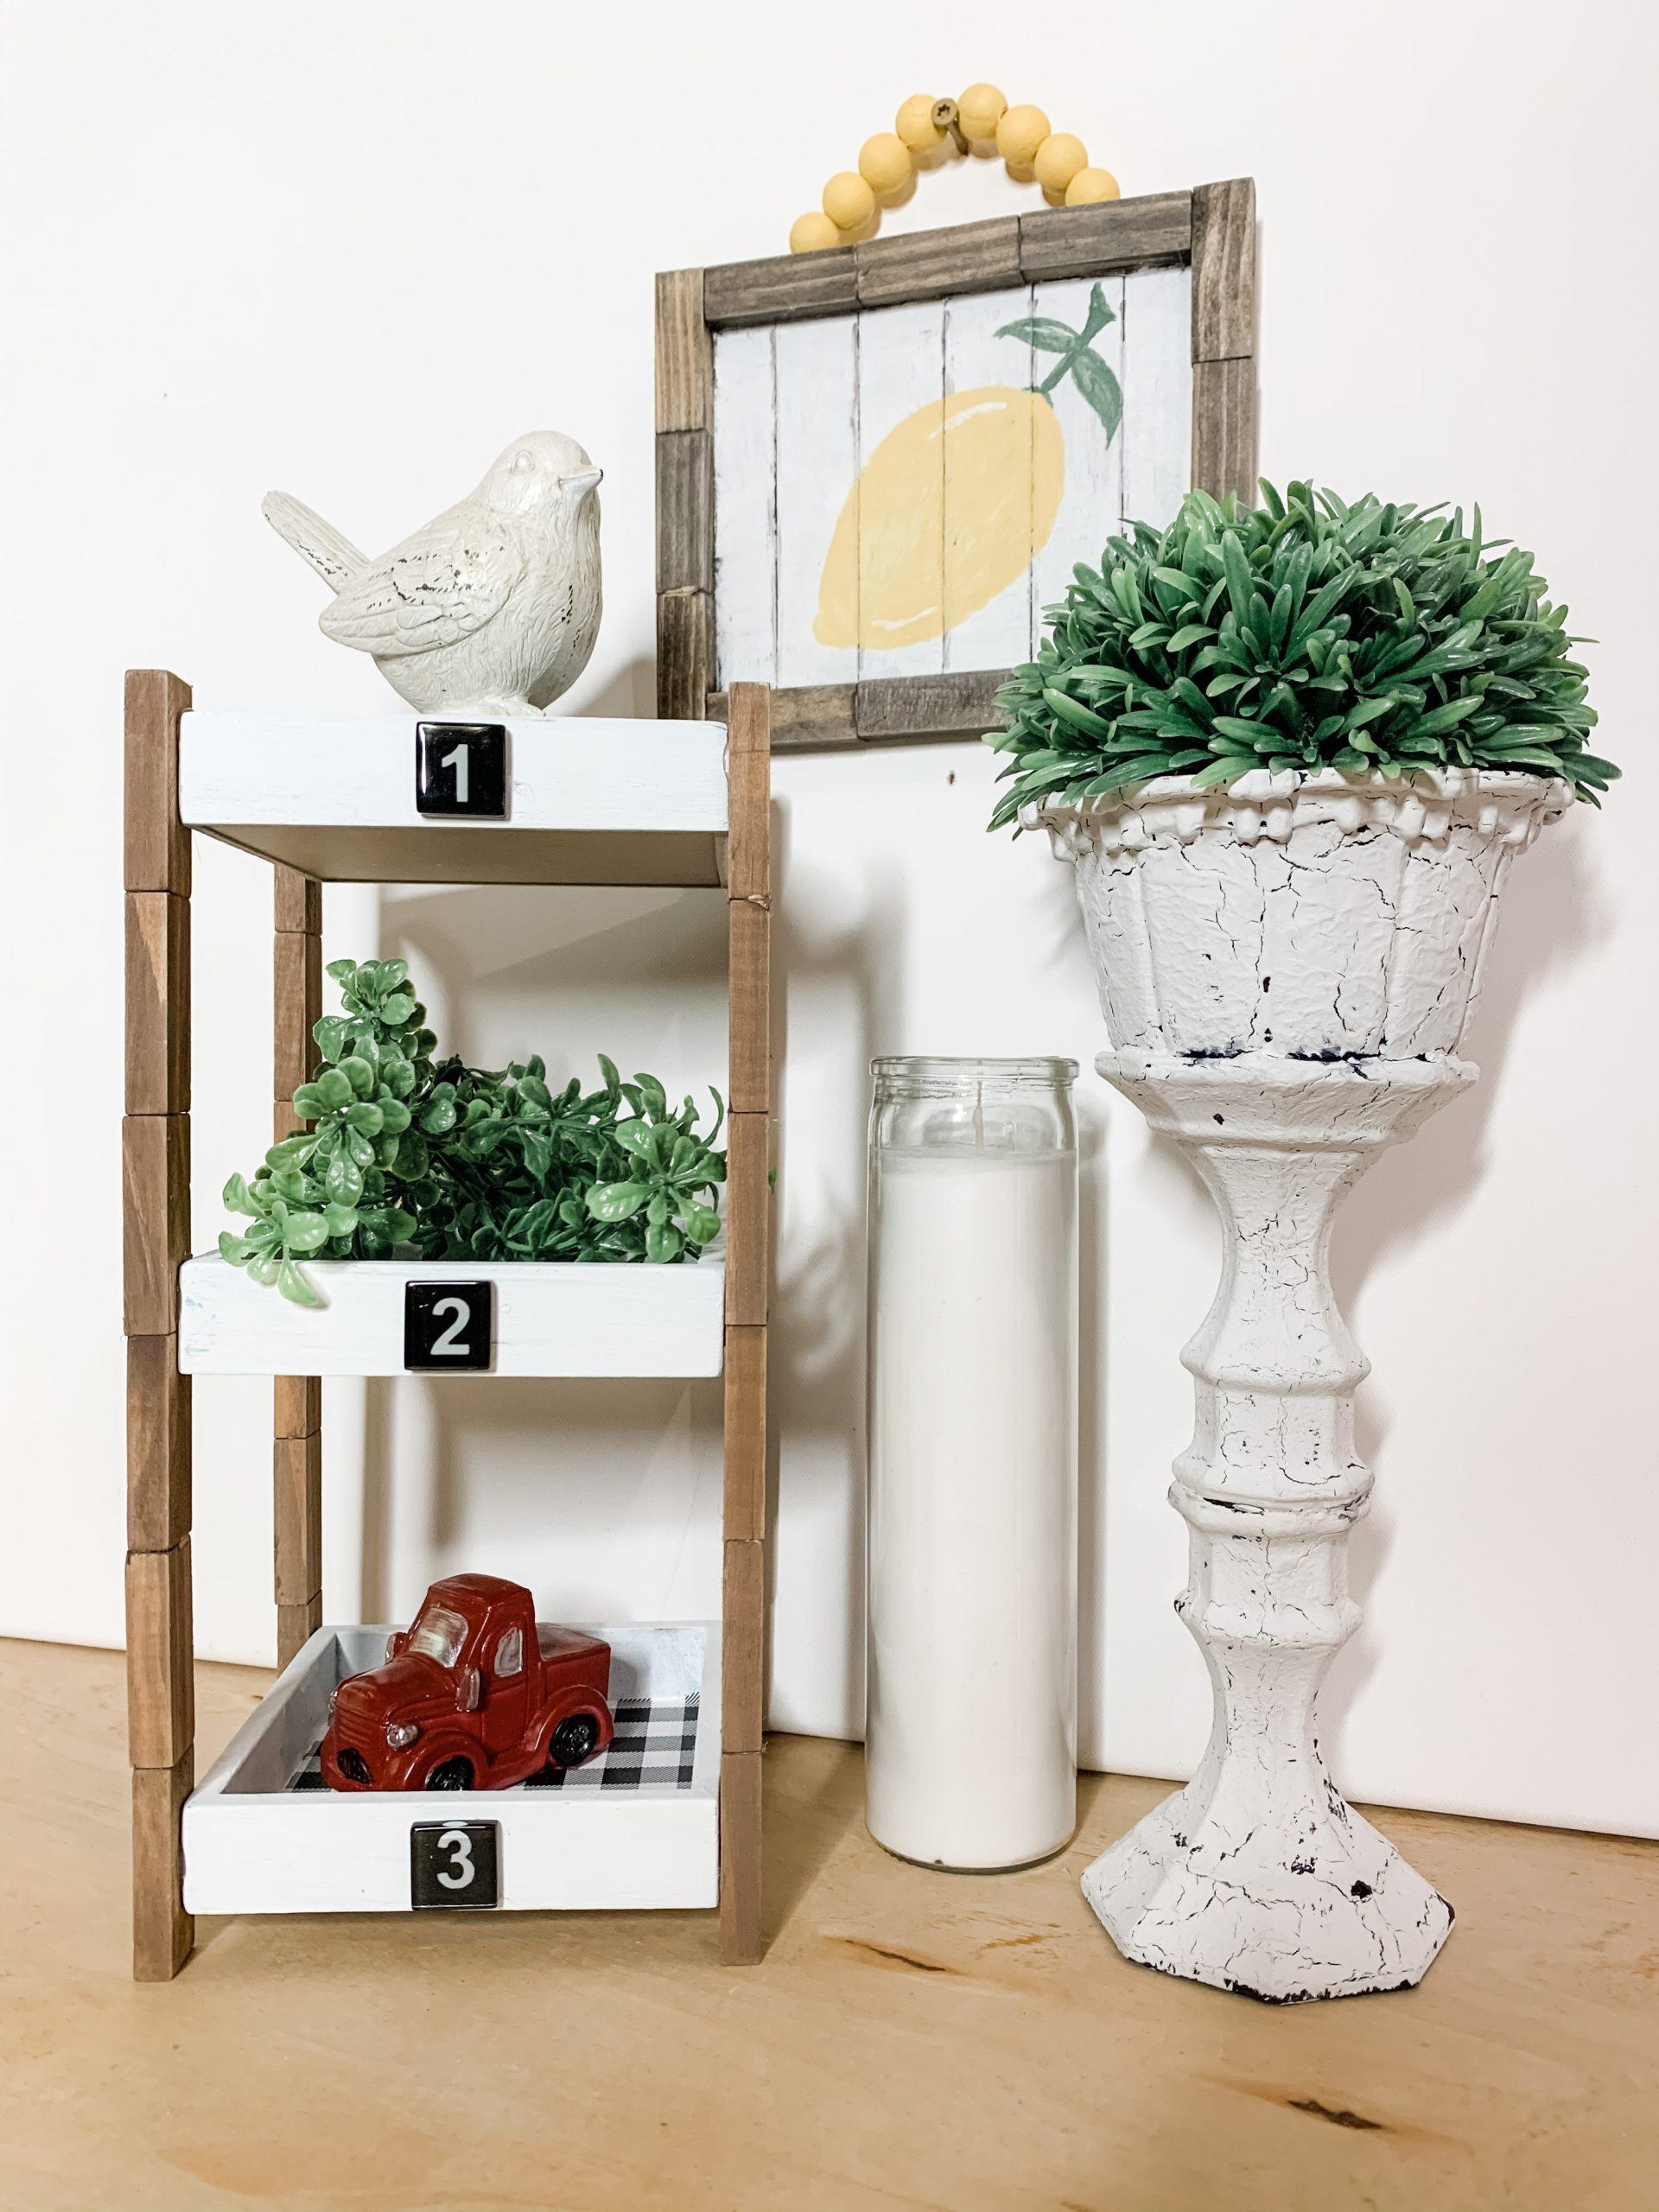 Rustic Dollar Tree DIY 3 Tiered Shelf